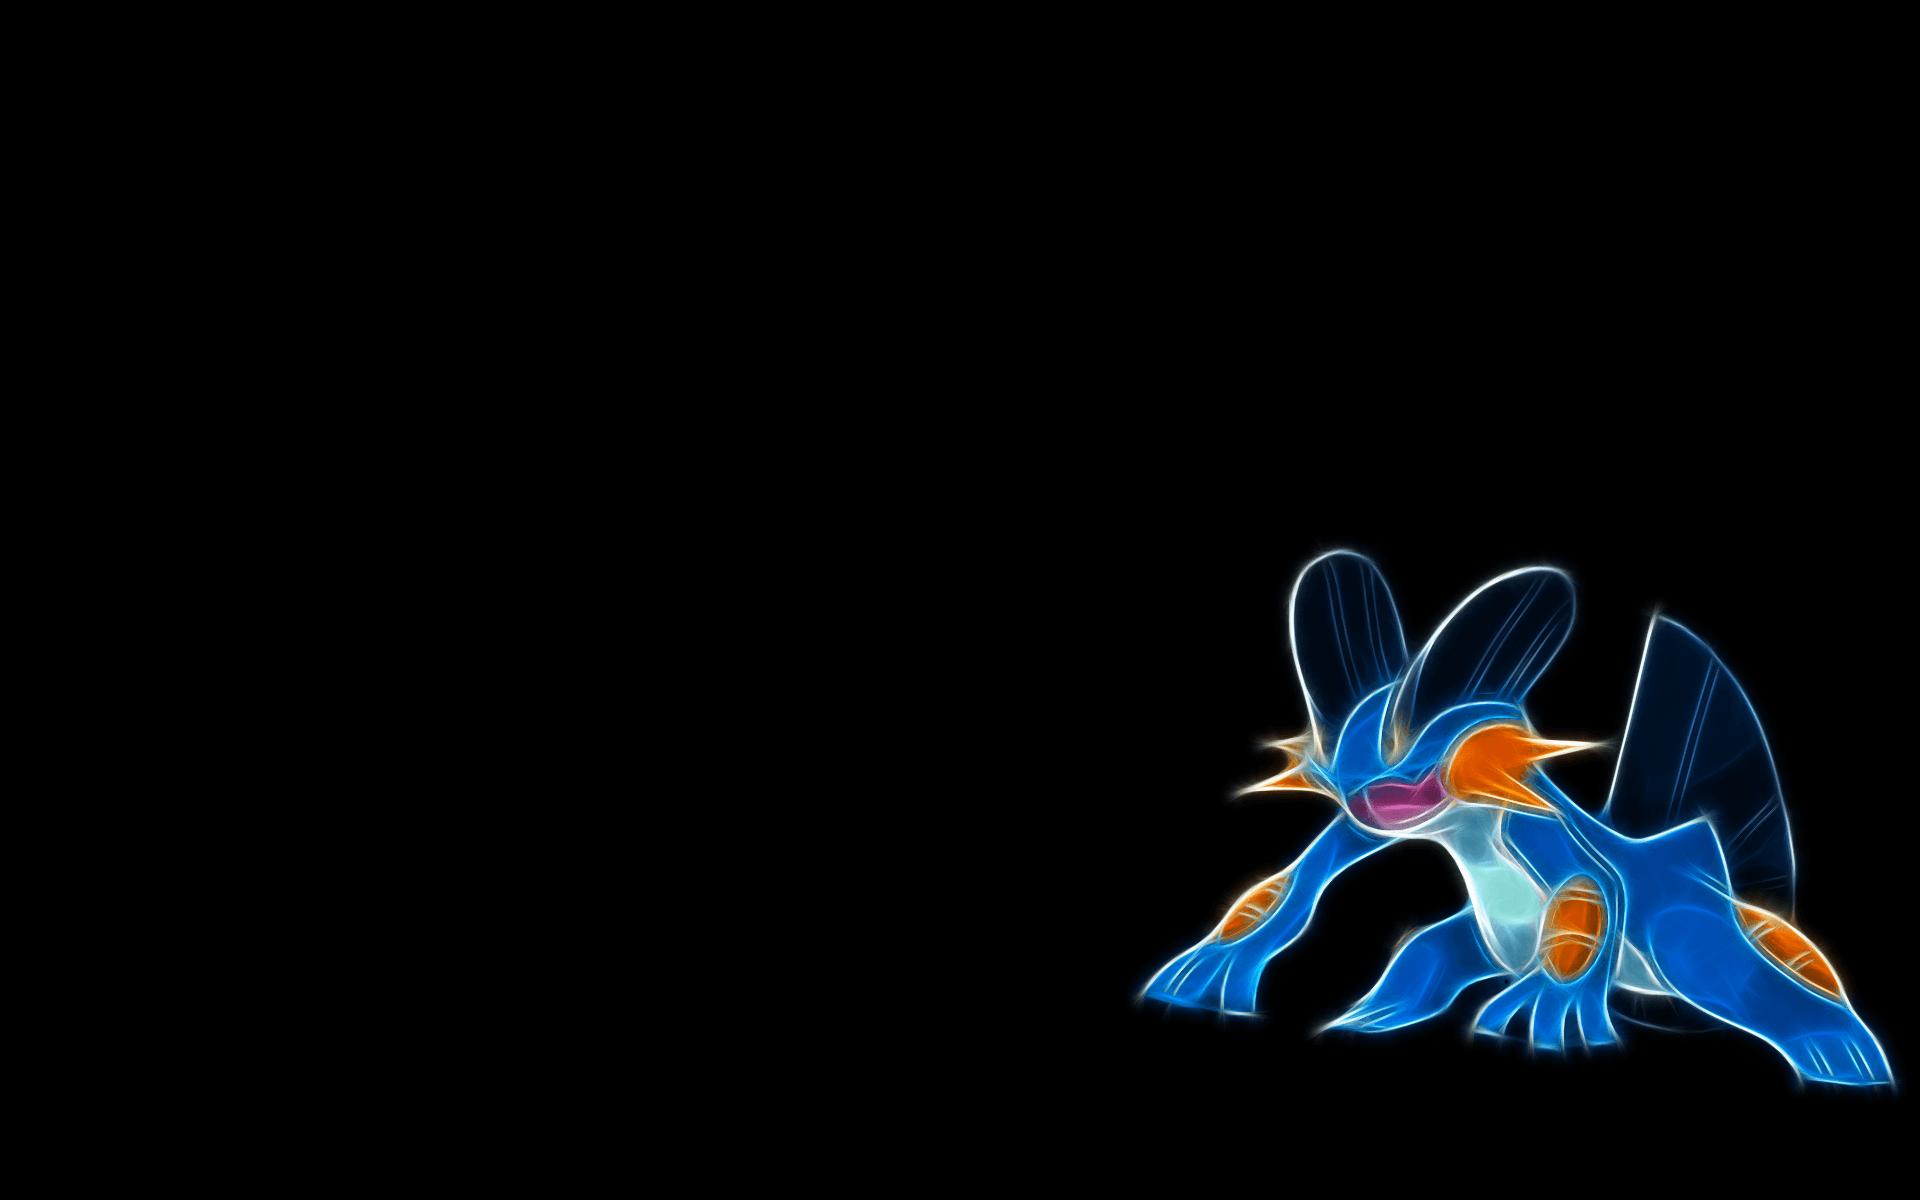 pokemon simple background black - photo #19